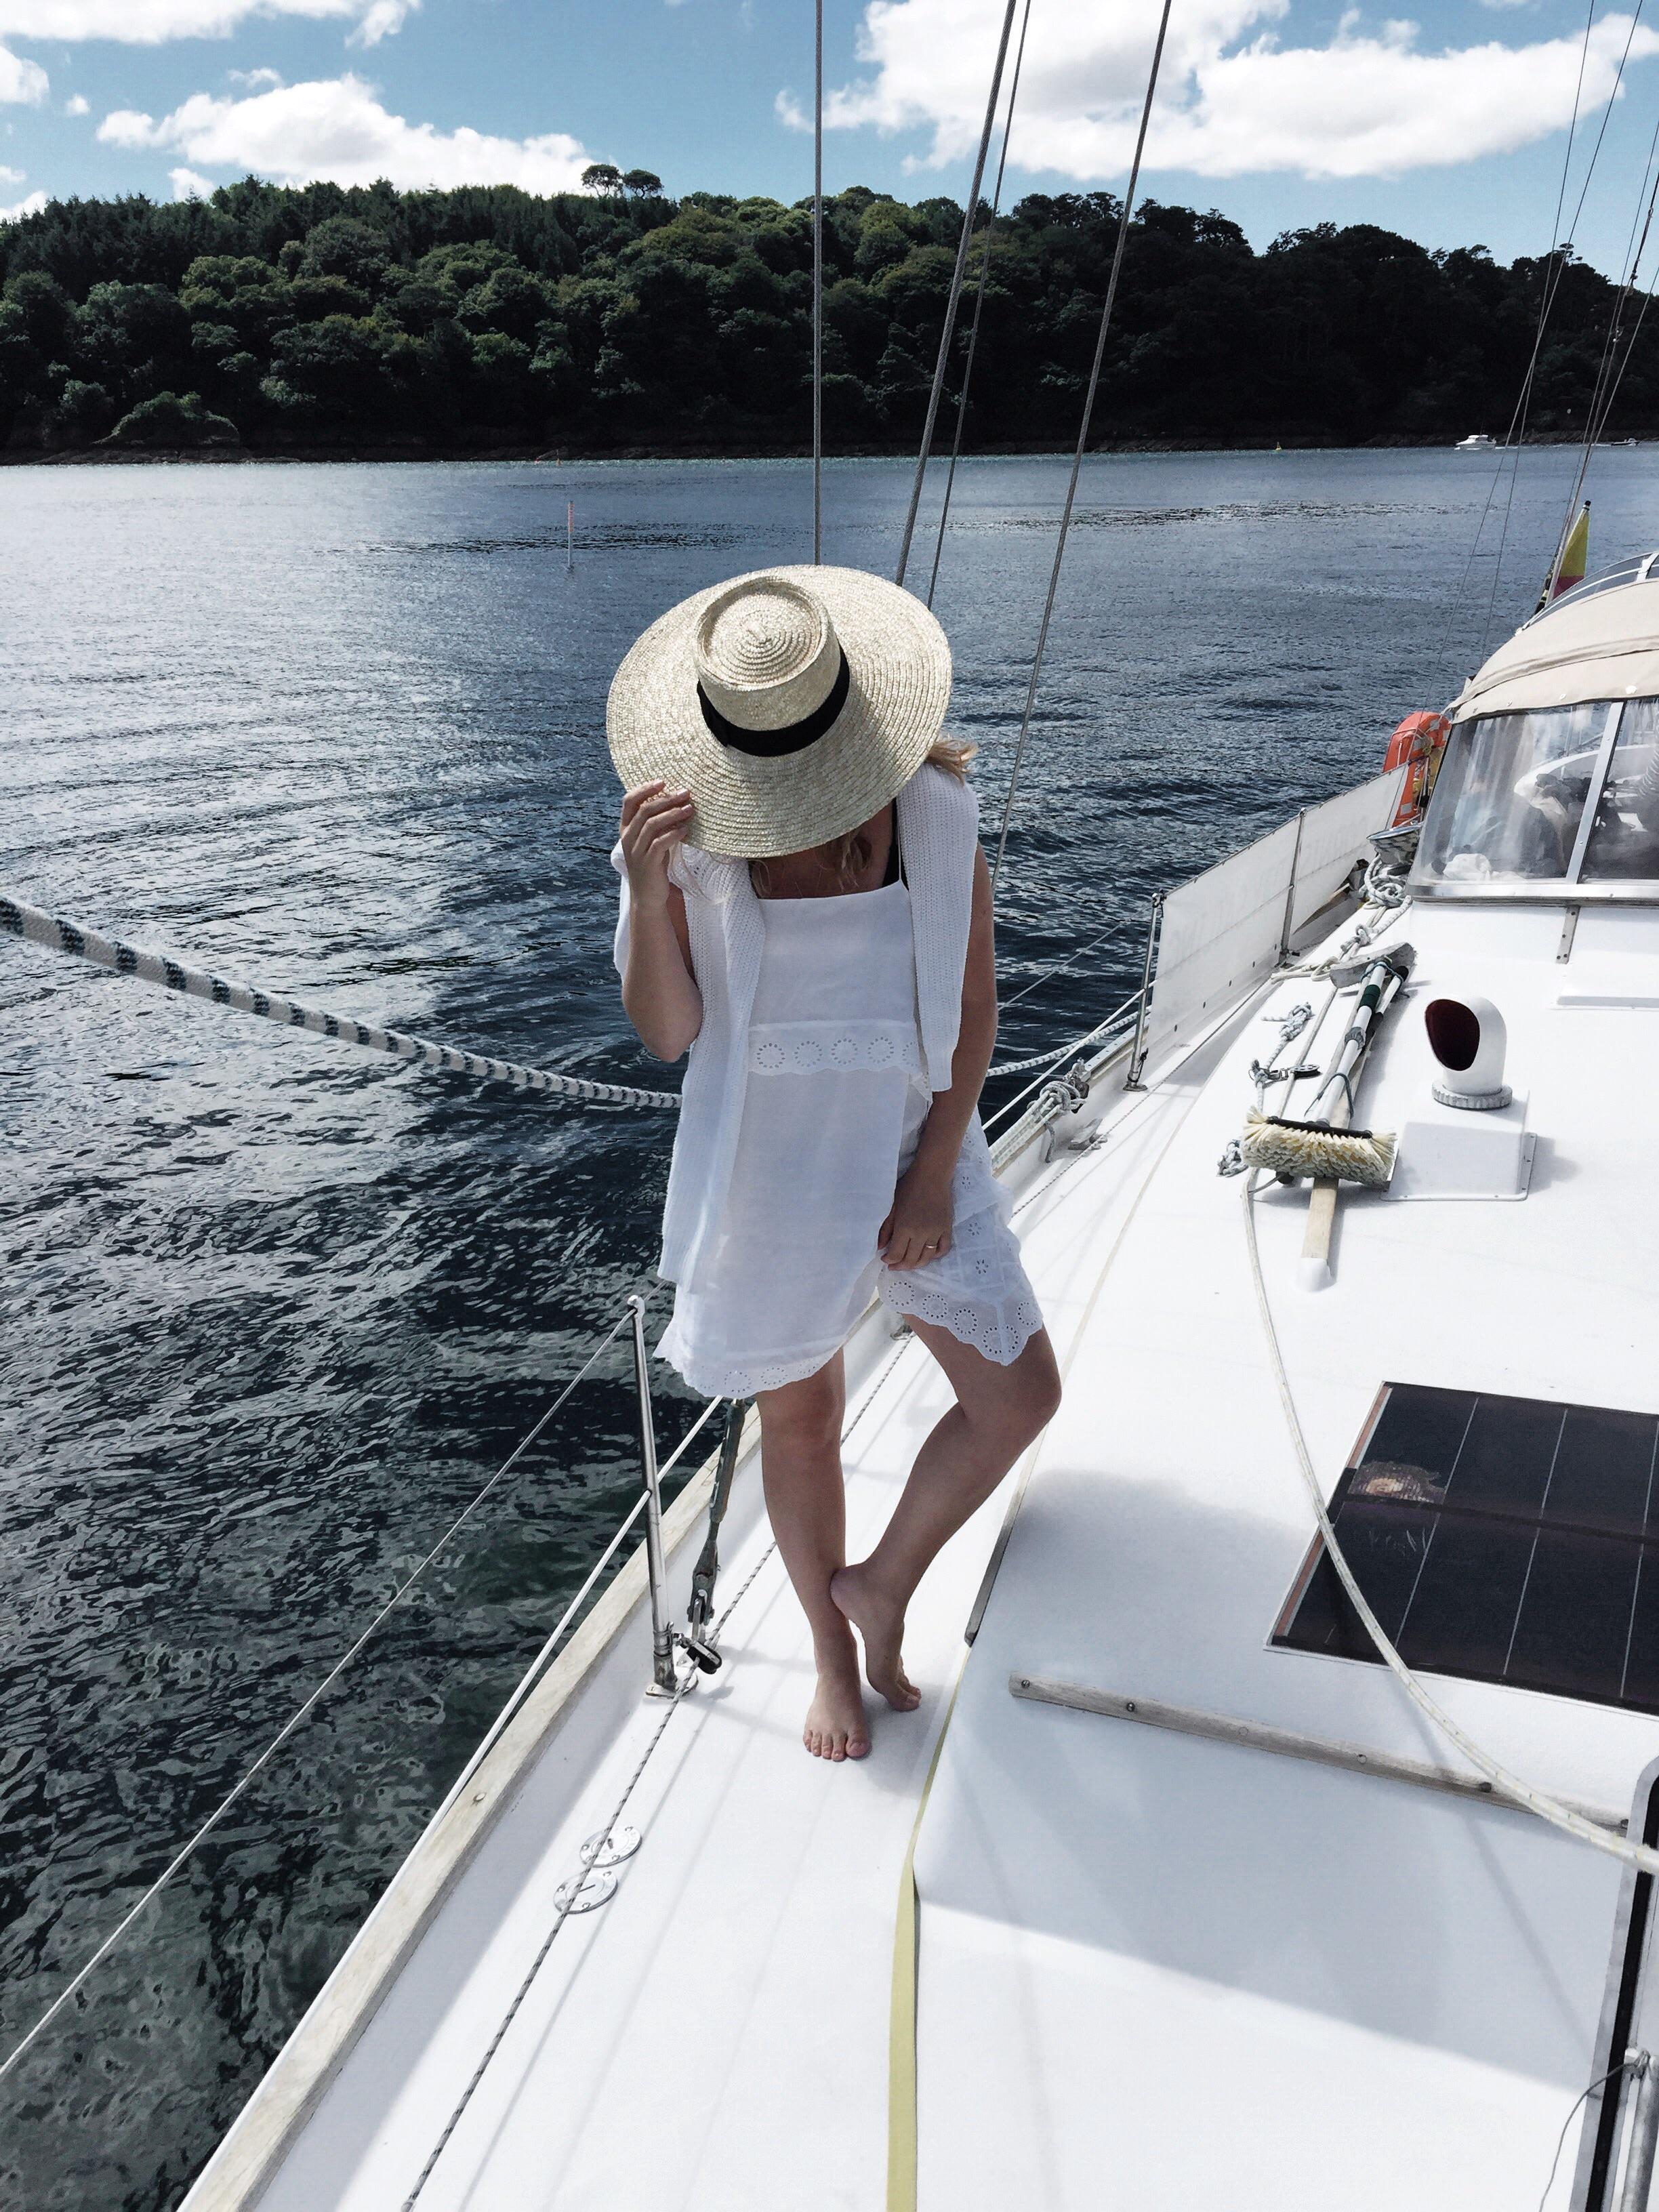 cornish day sailing heyo!